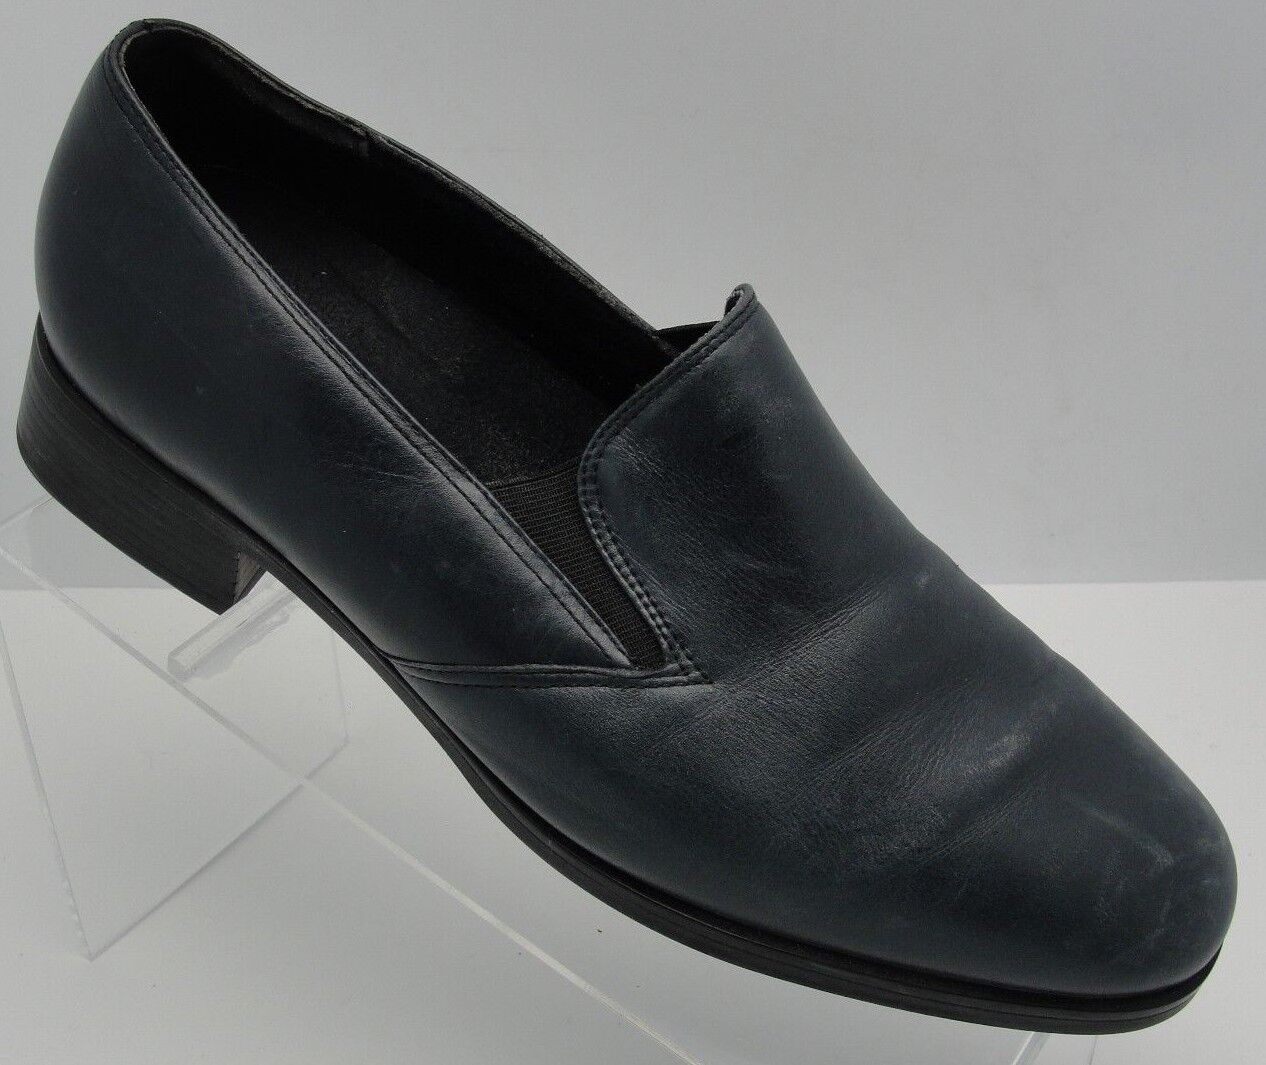 Munro American Women Sz 9.5 Walking Block Heel Casual Navy Leather Stretch shoes